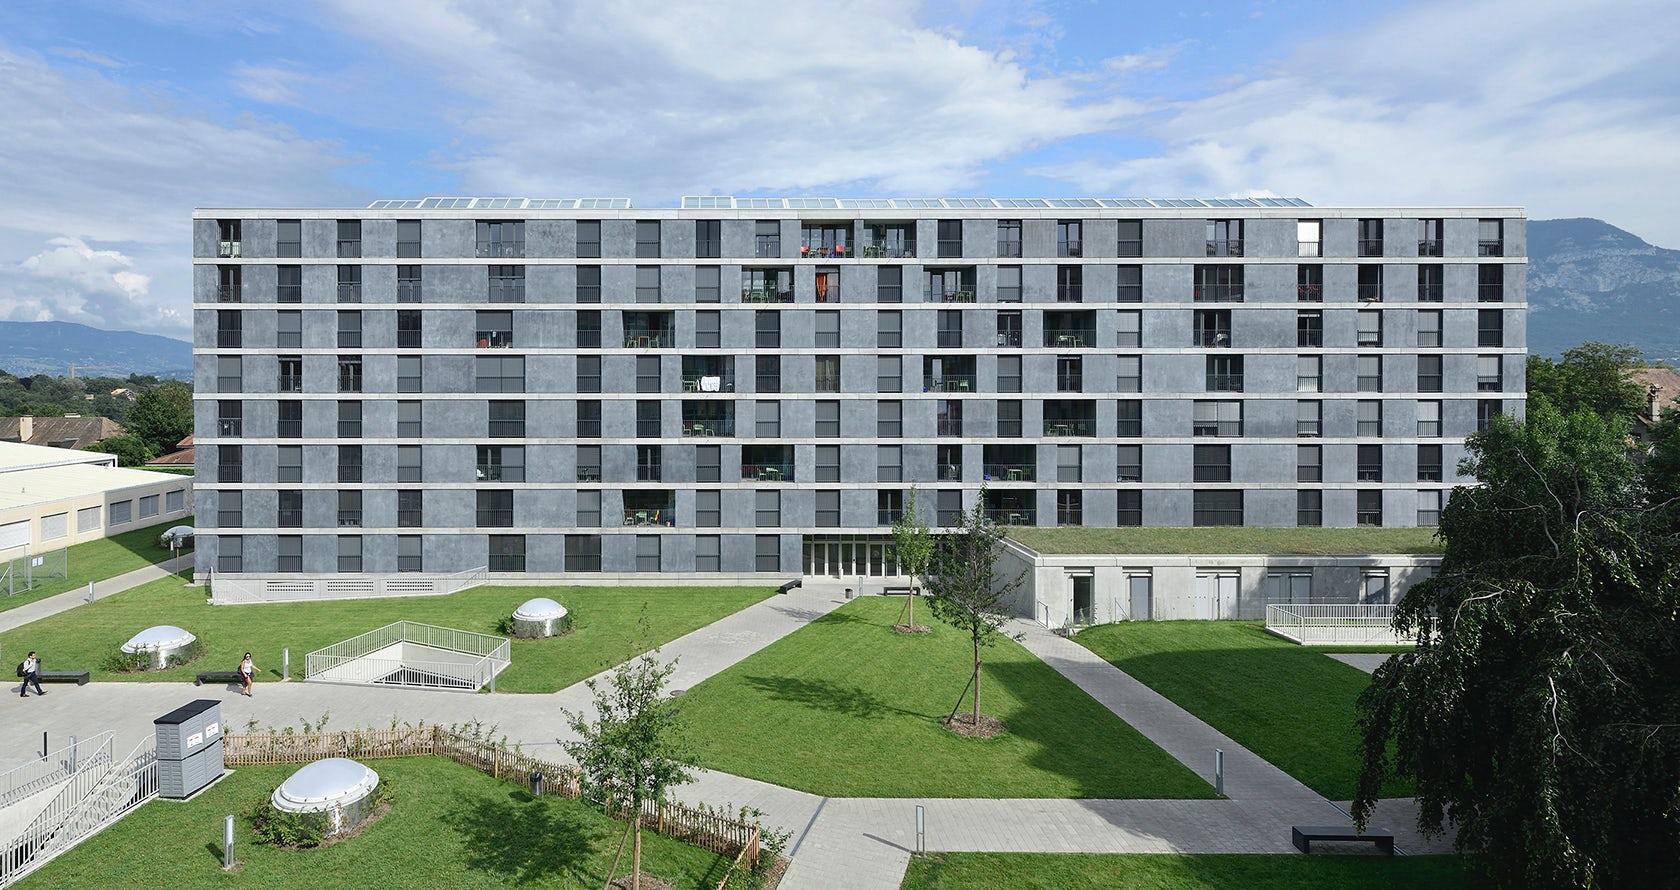 Student Housing in Geneva - Architizer